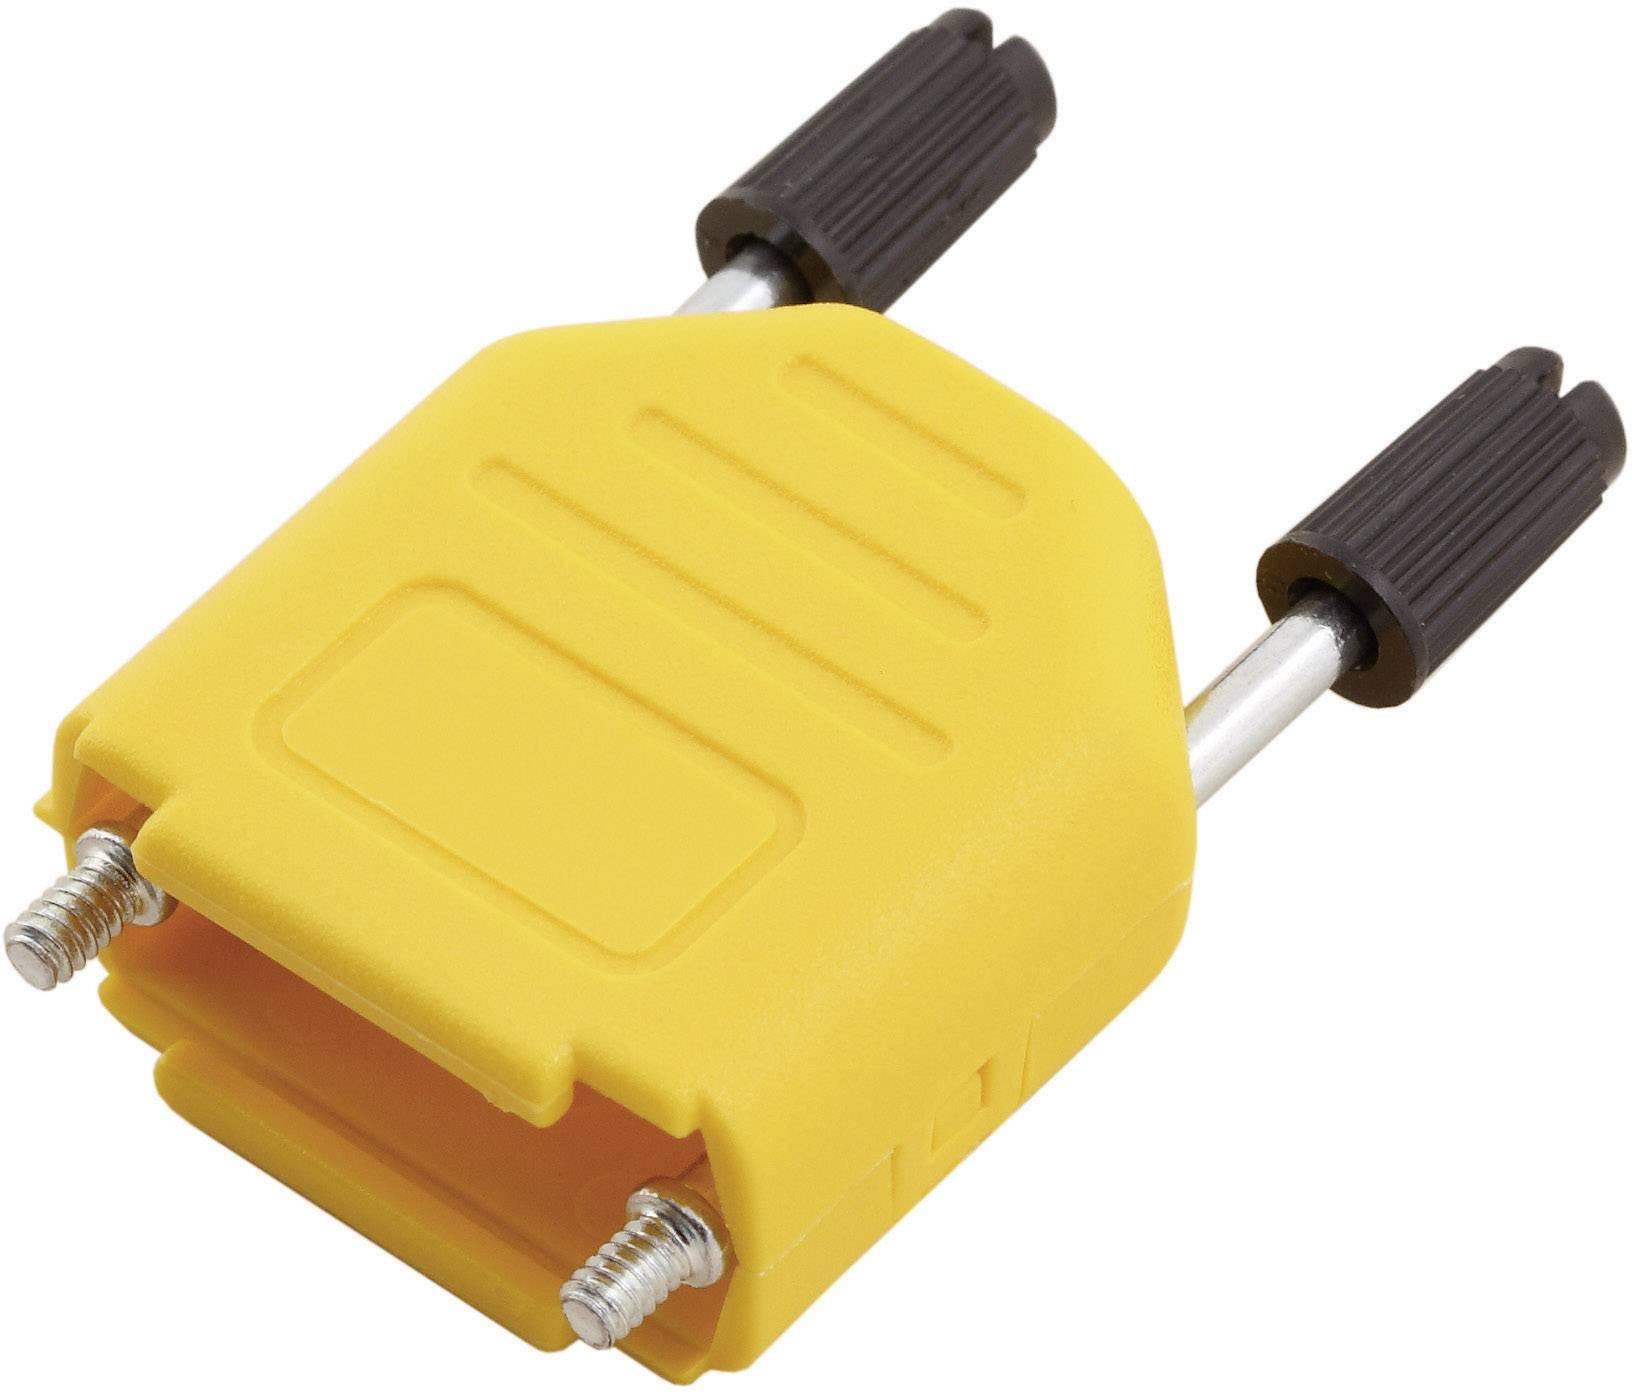 D-SUB púzdro MH Connectors MHDPPK25-Y-K 6353-0105-03, počet pinov: 25, plast, 180 °, žltá, 1 ks